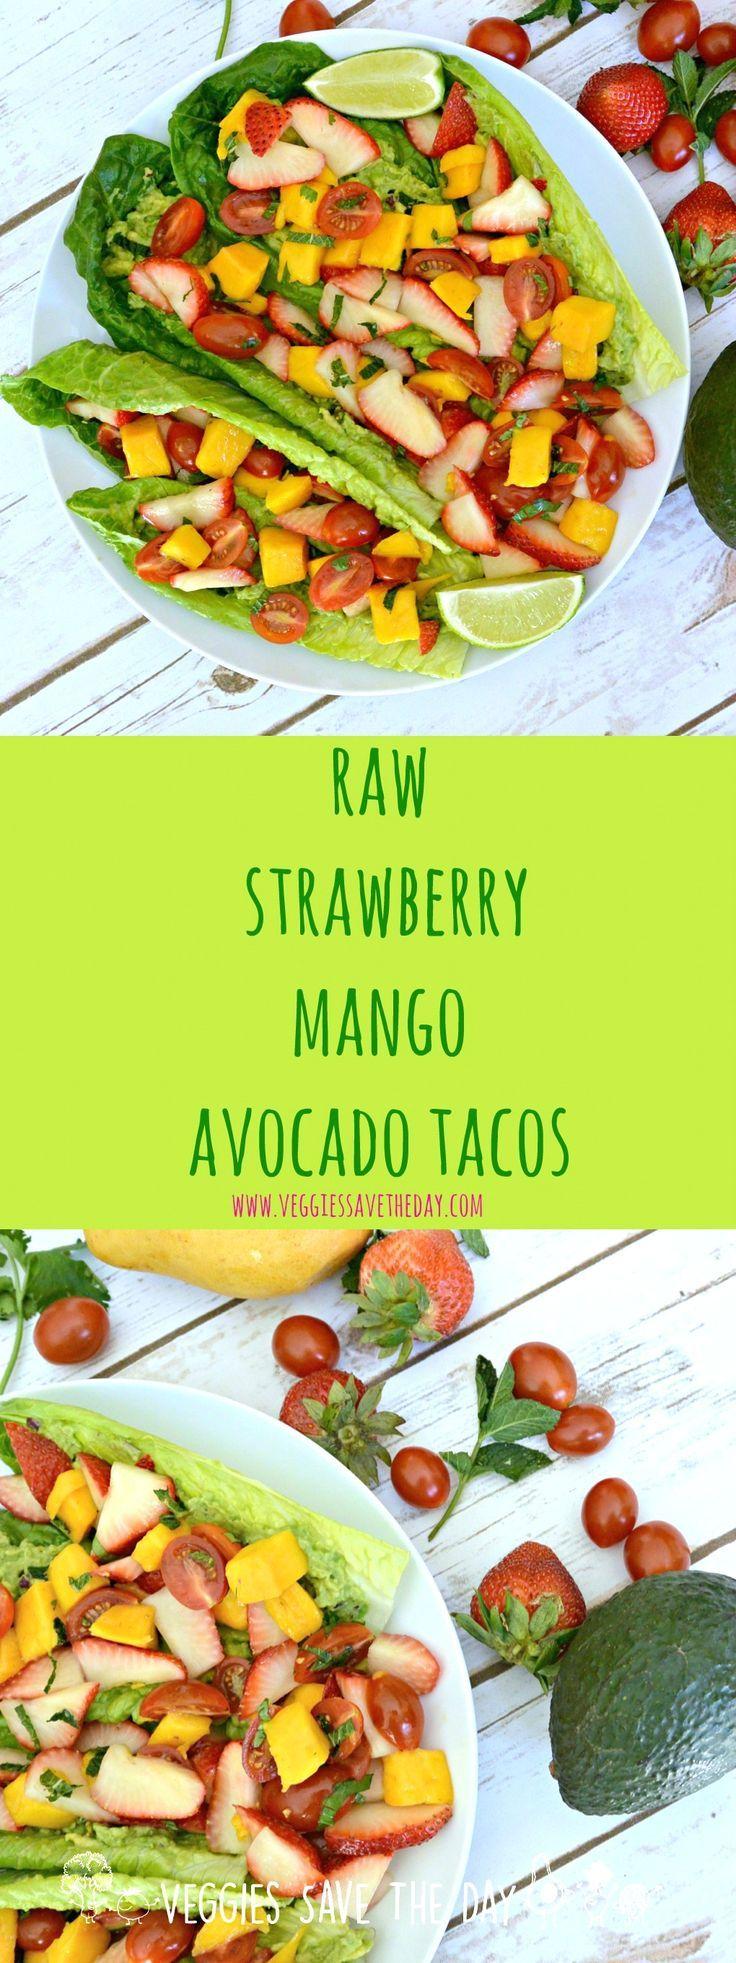 Raw Strawberry Mango Avocado Tacos (vegan, gluten free, healthy)